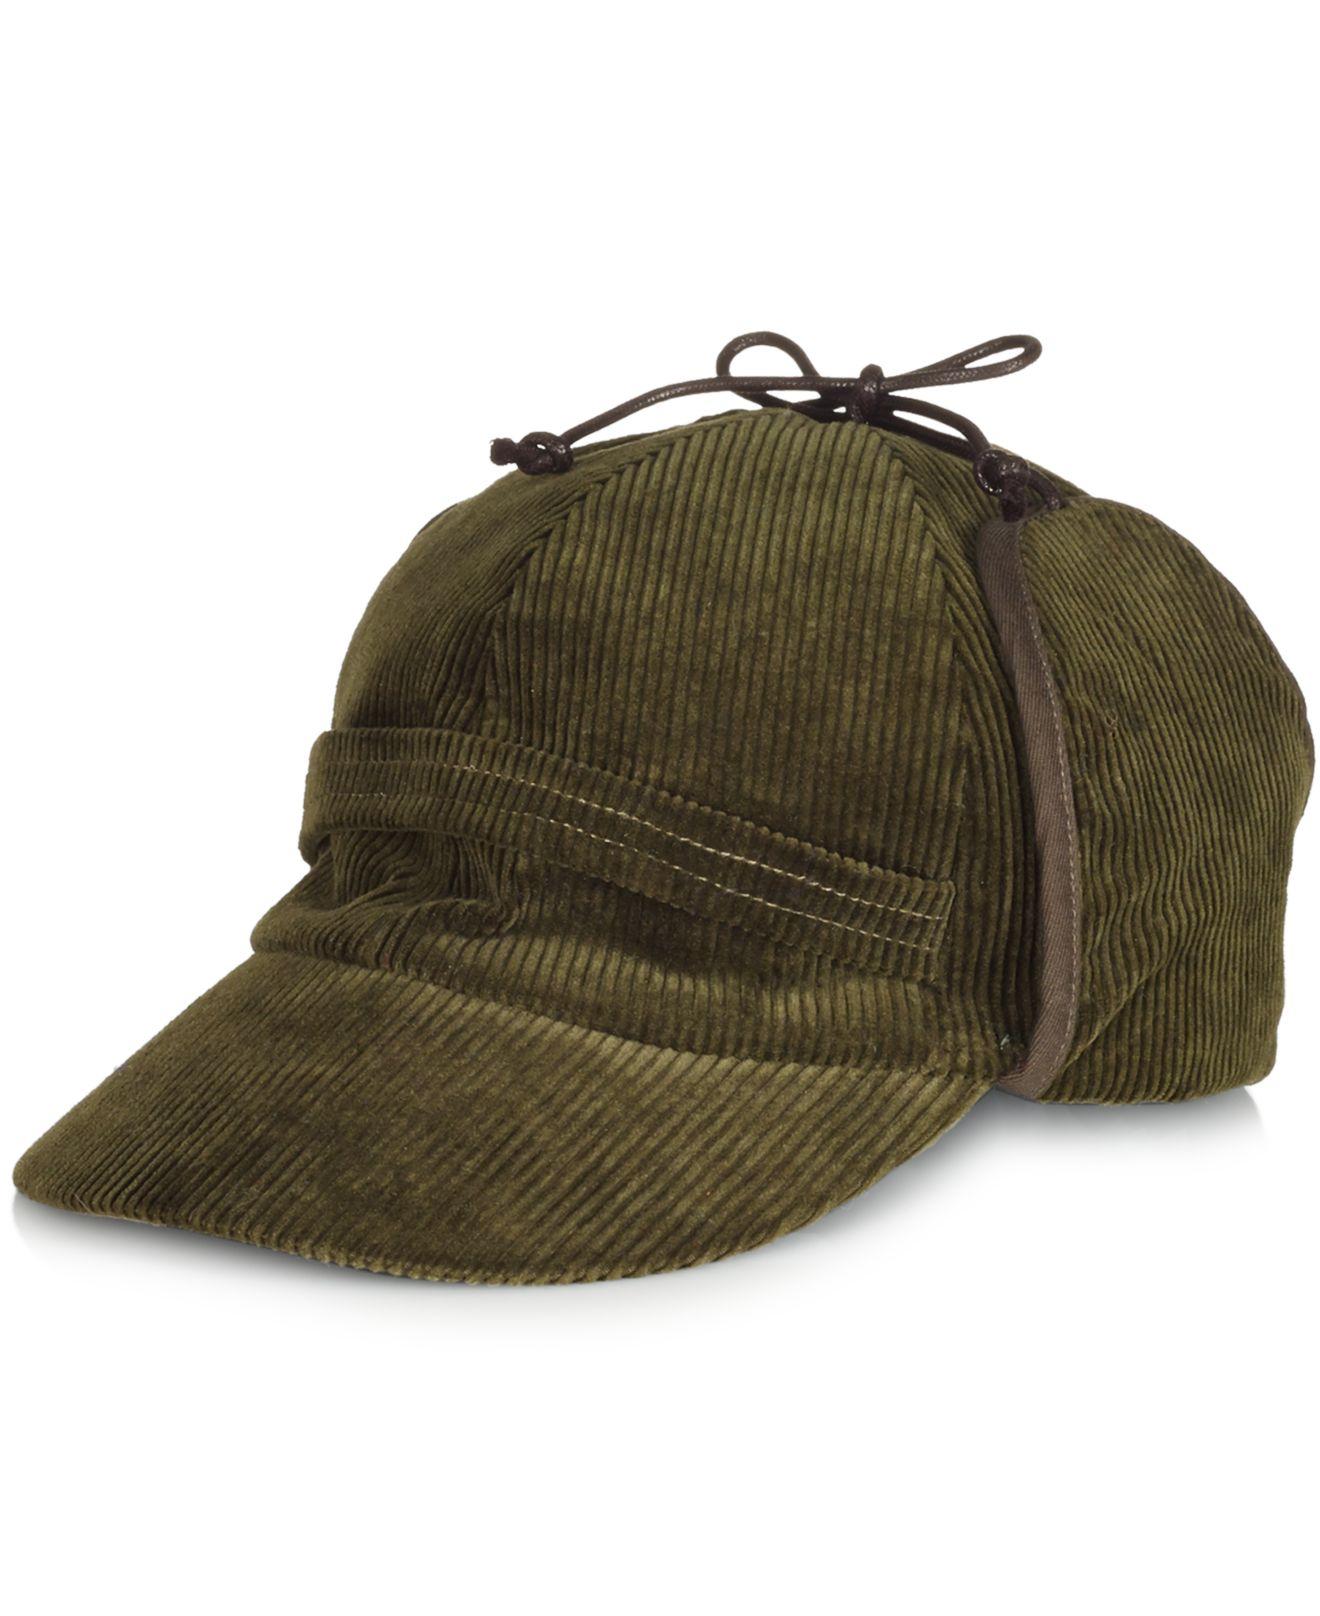 6409fa51f5c3c Polo Ralph Lauren Vintage Ridge Corduroy Hat in Green for Men - Lyst